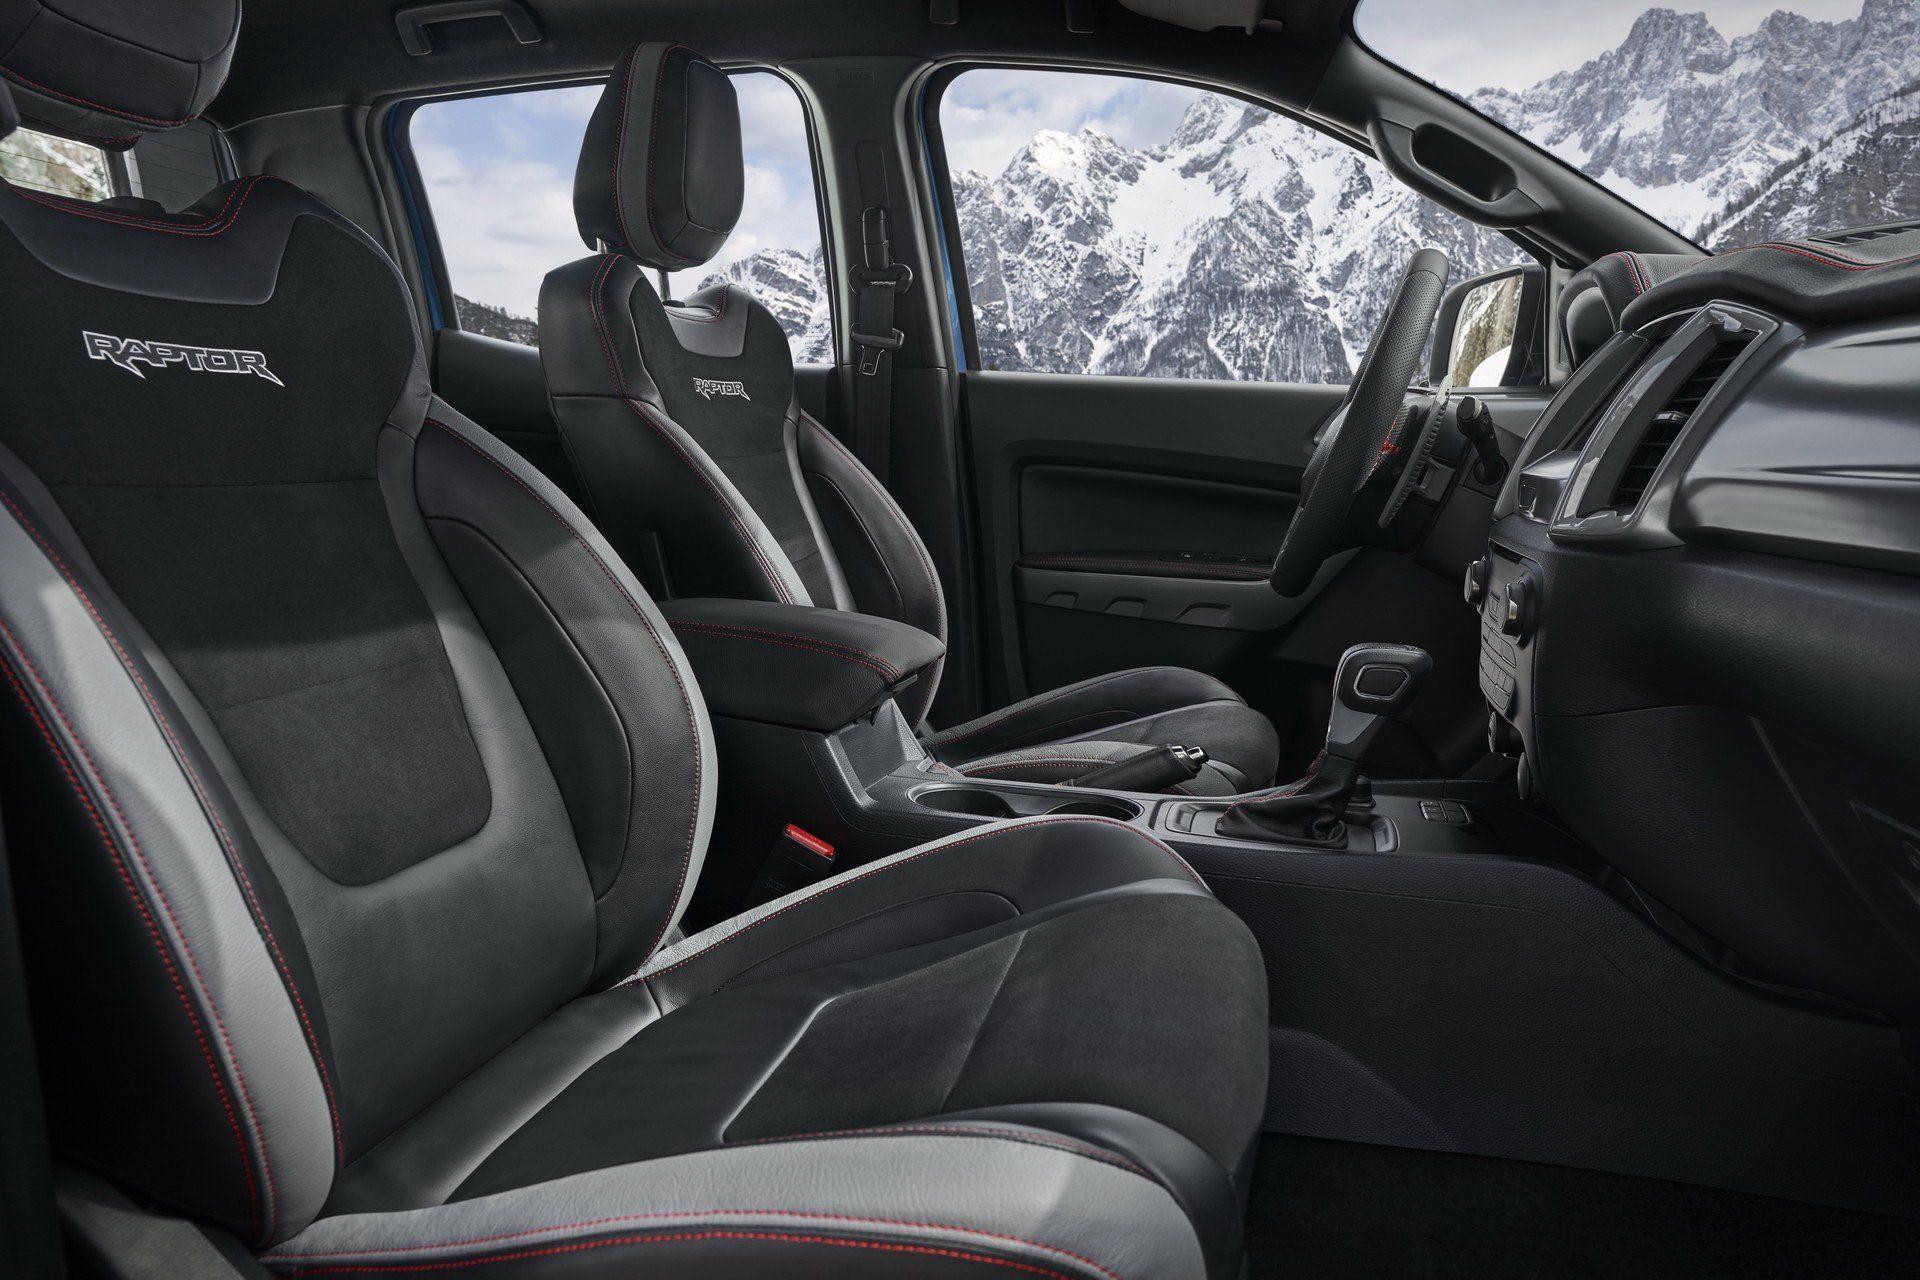 Ford_Ranger_Raptor_Special_Edition-0009